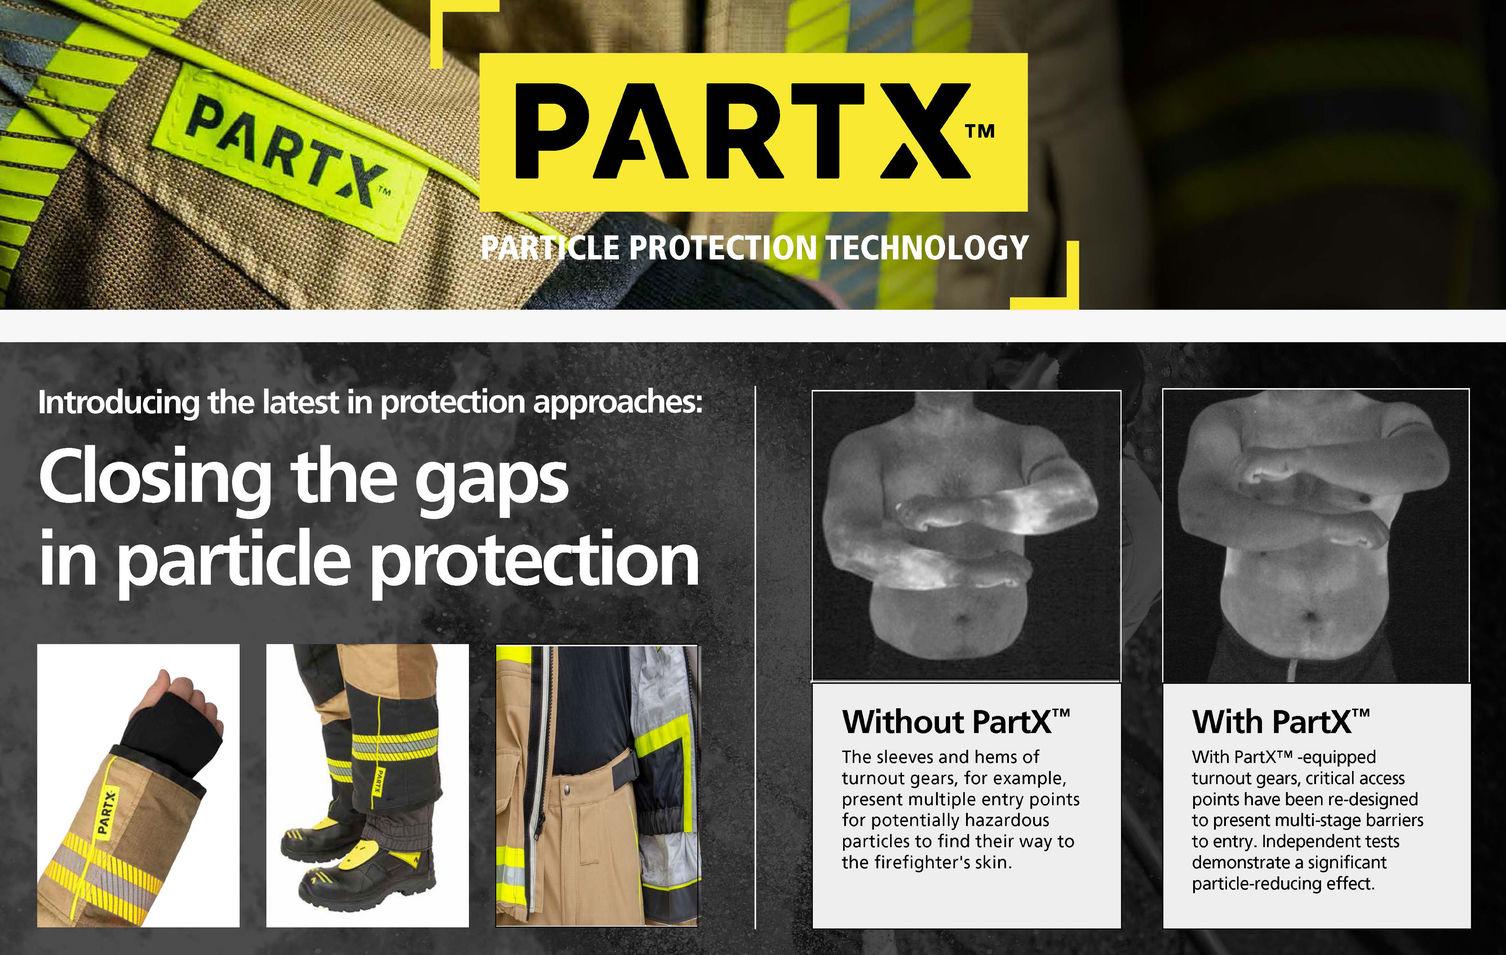 VIKING PartX Particle Protection Technology Fire fighter wear En469 Feuerwehr